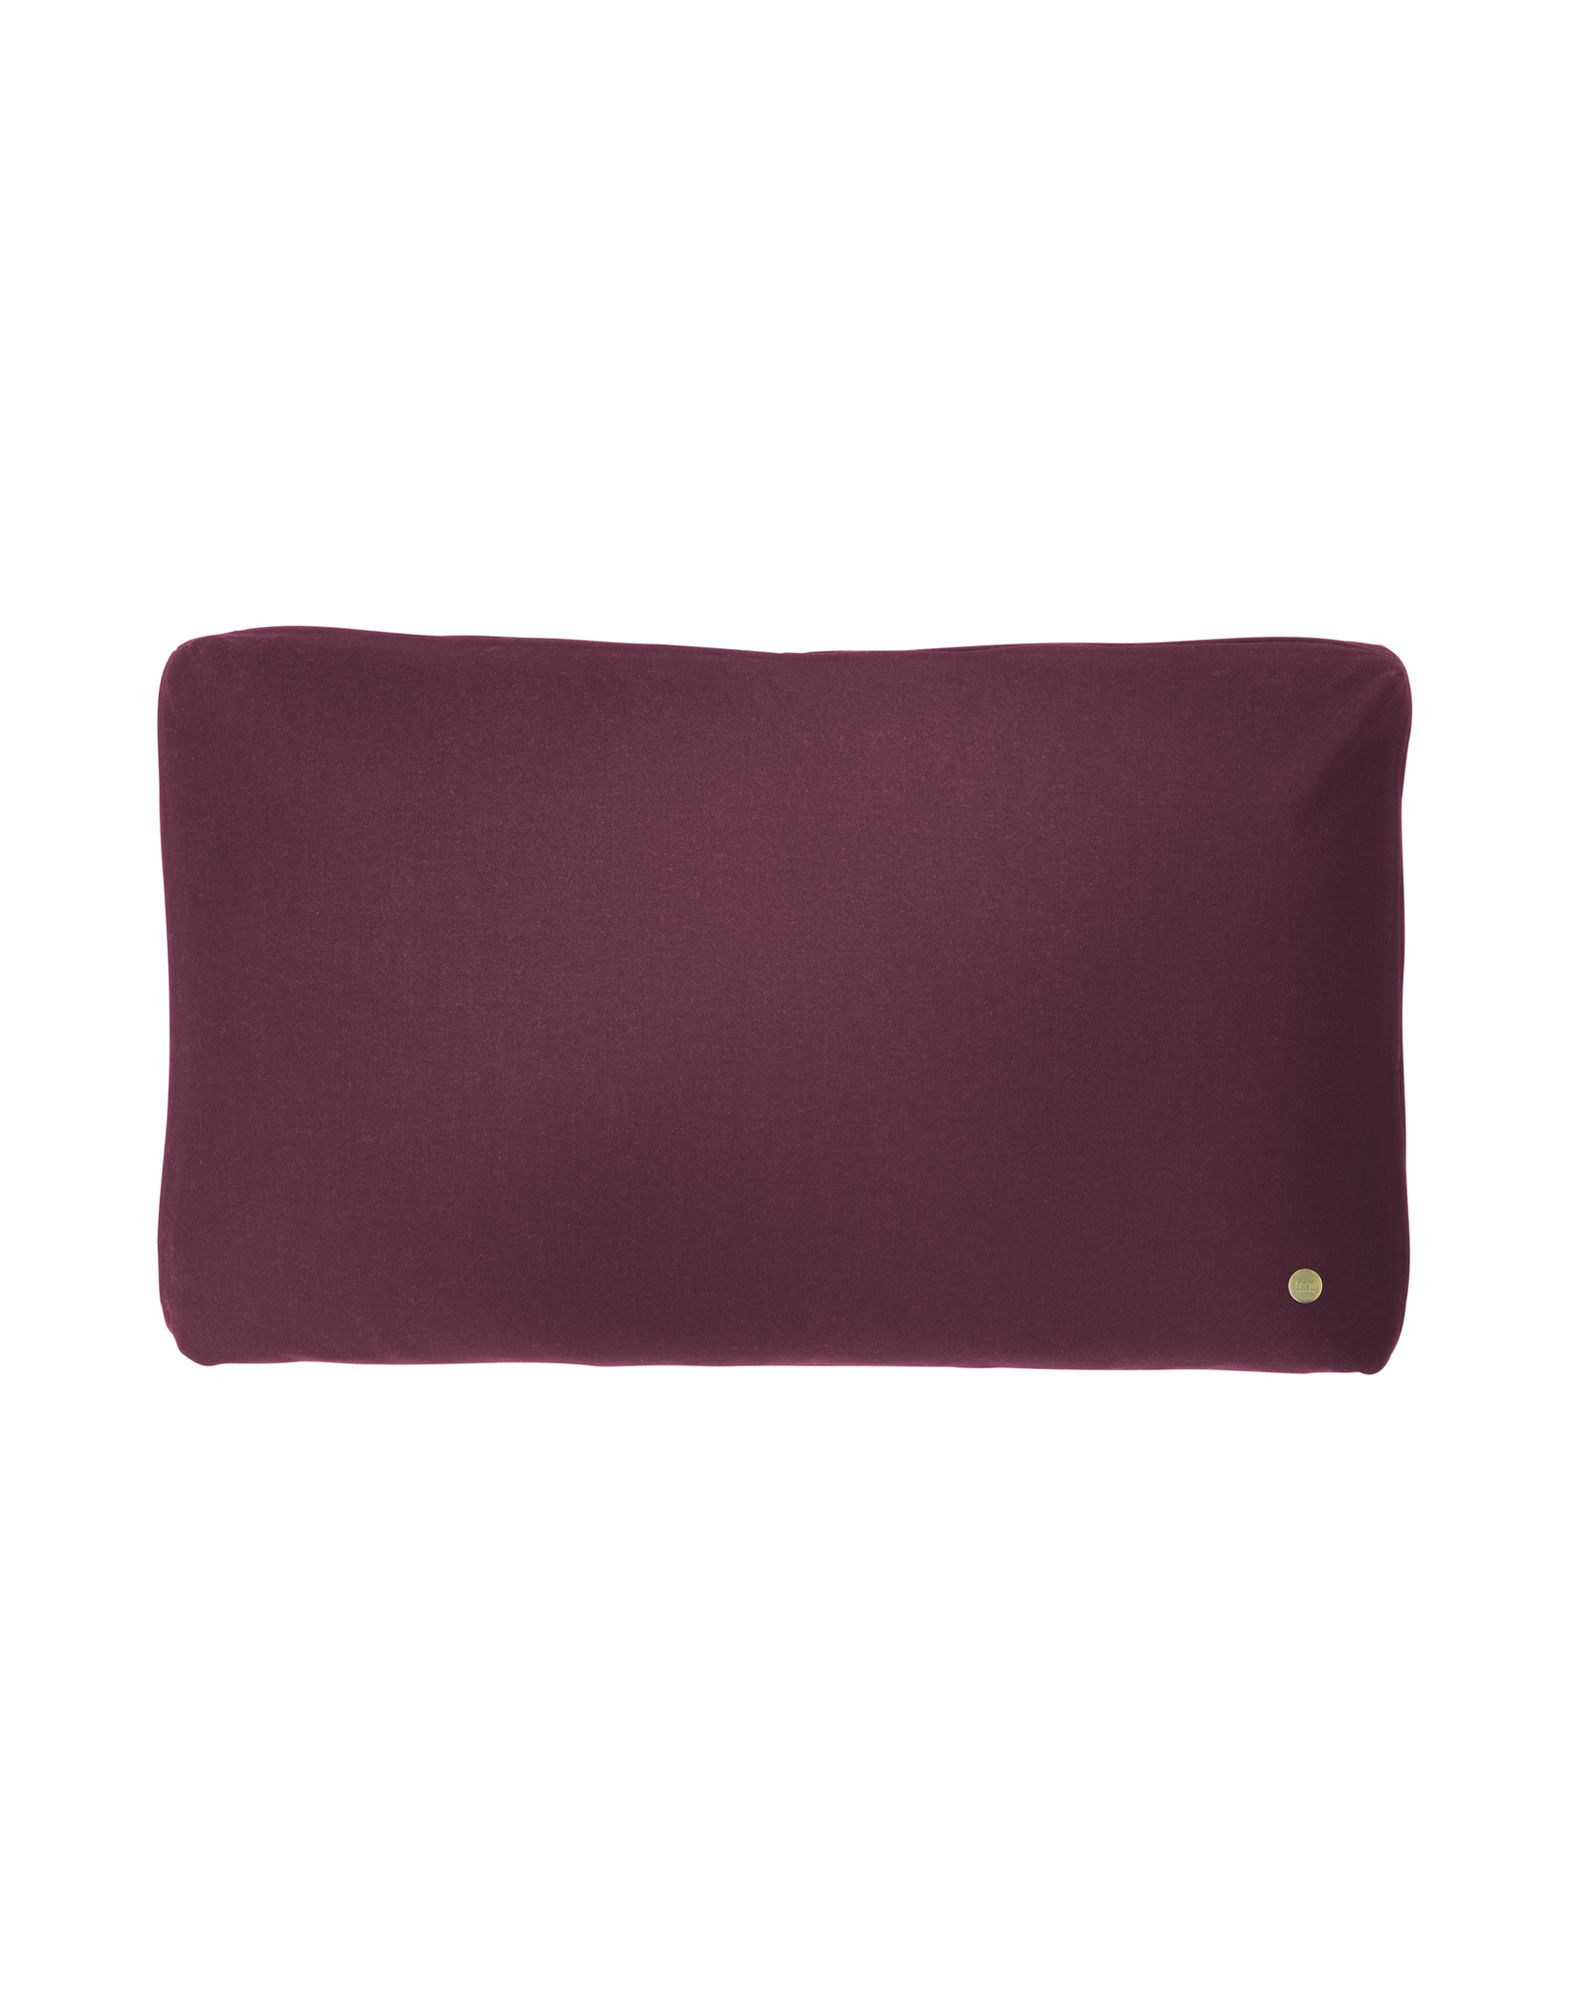 ferm living pillows shop at ebates. Black Bedroom Furniture Sets. Home Design Ideas